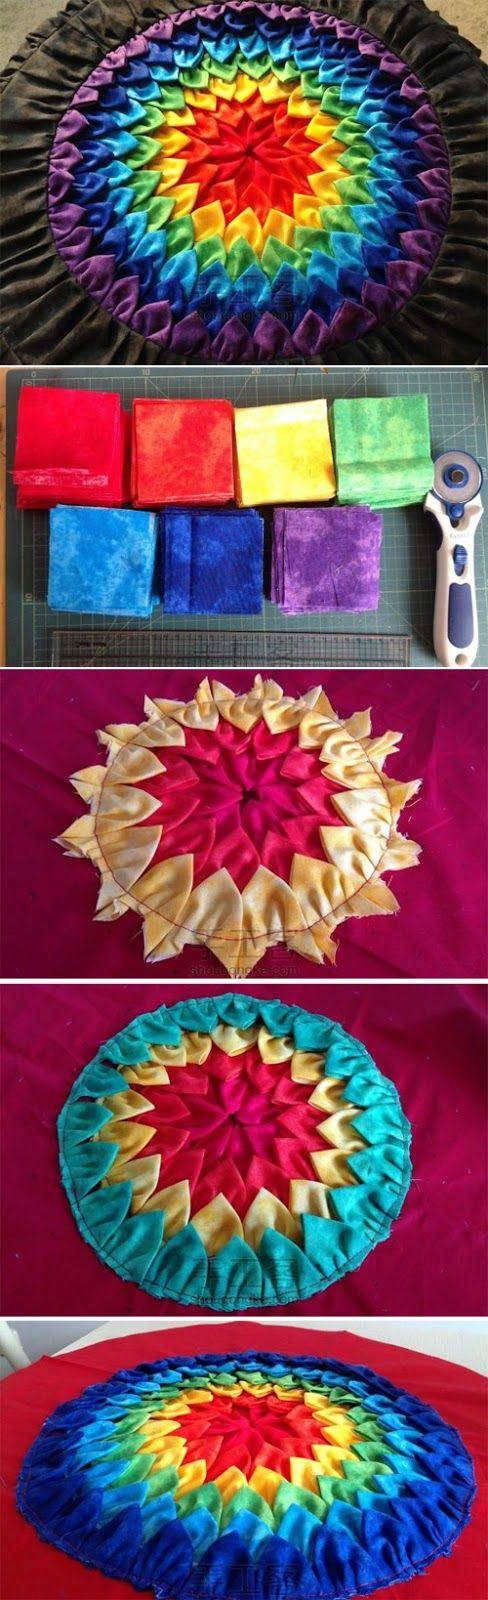 Patchwork cushion rainbow DIY Tutorial  http://www.handmadiya.com/2015/07/patchwork-cushion-rainbow-diy.html